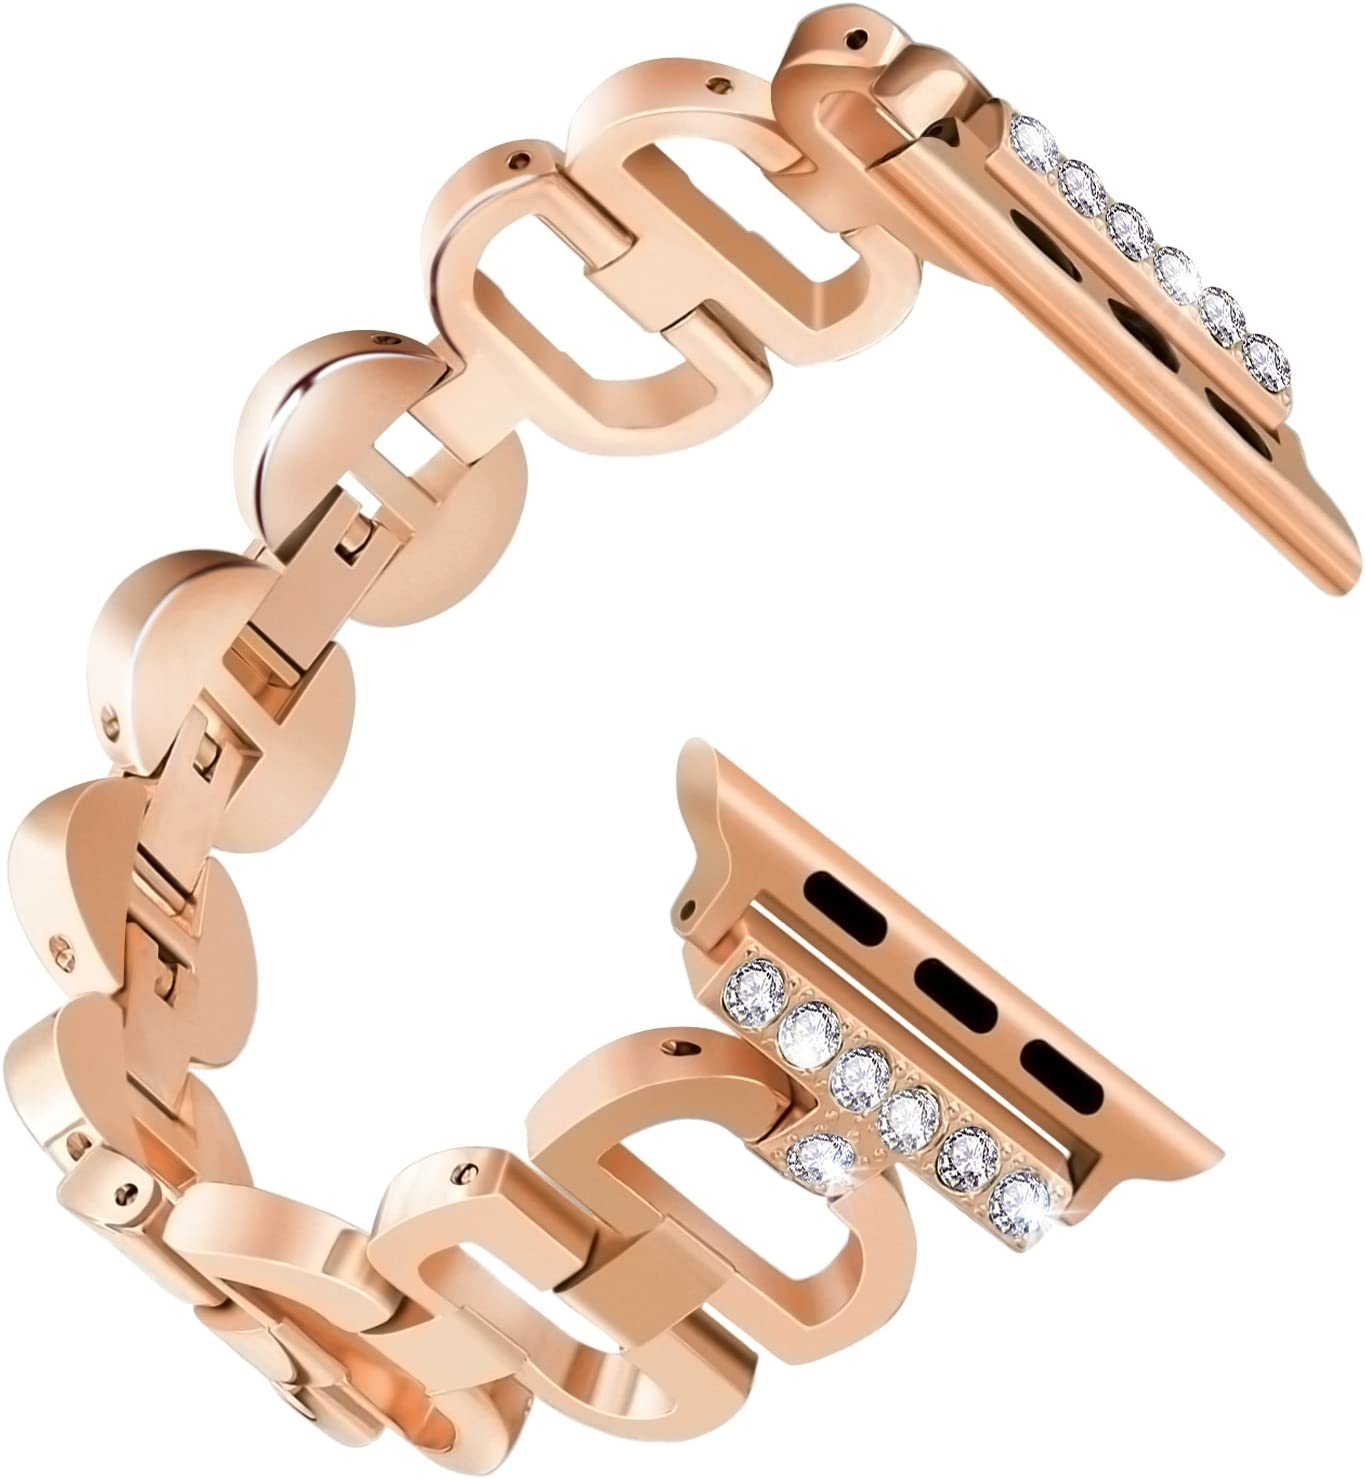 B BELK Bling Crystal Glitter Diamond Band Compatible Apple Watch Band 38mm iWatch Series 3, Series 2, Series 1, Diamond Rhinestone Stainless Steel Metal Wristband Strap, Rose Gold